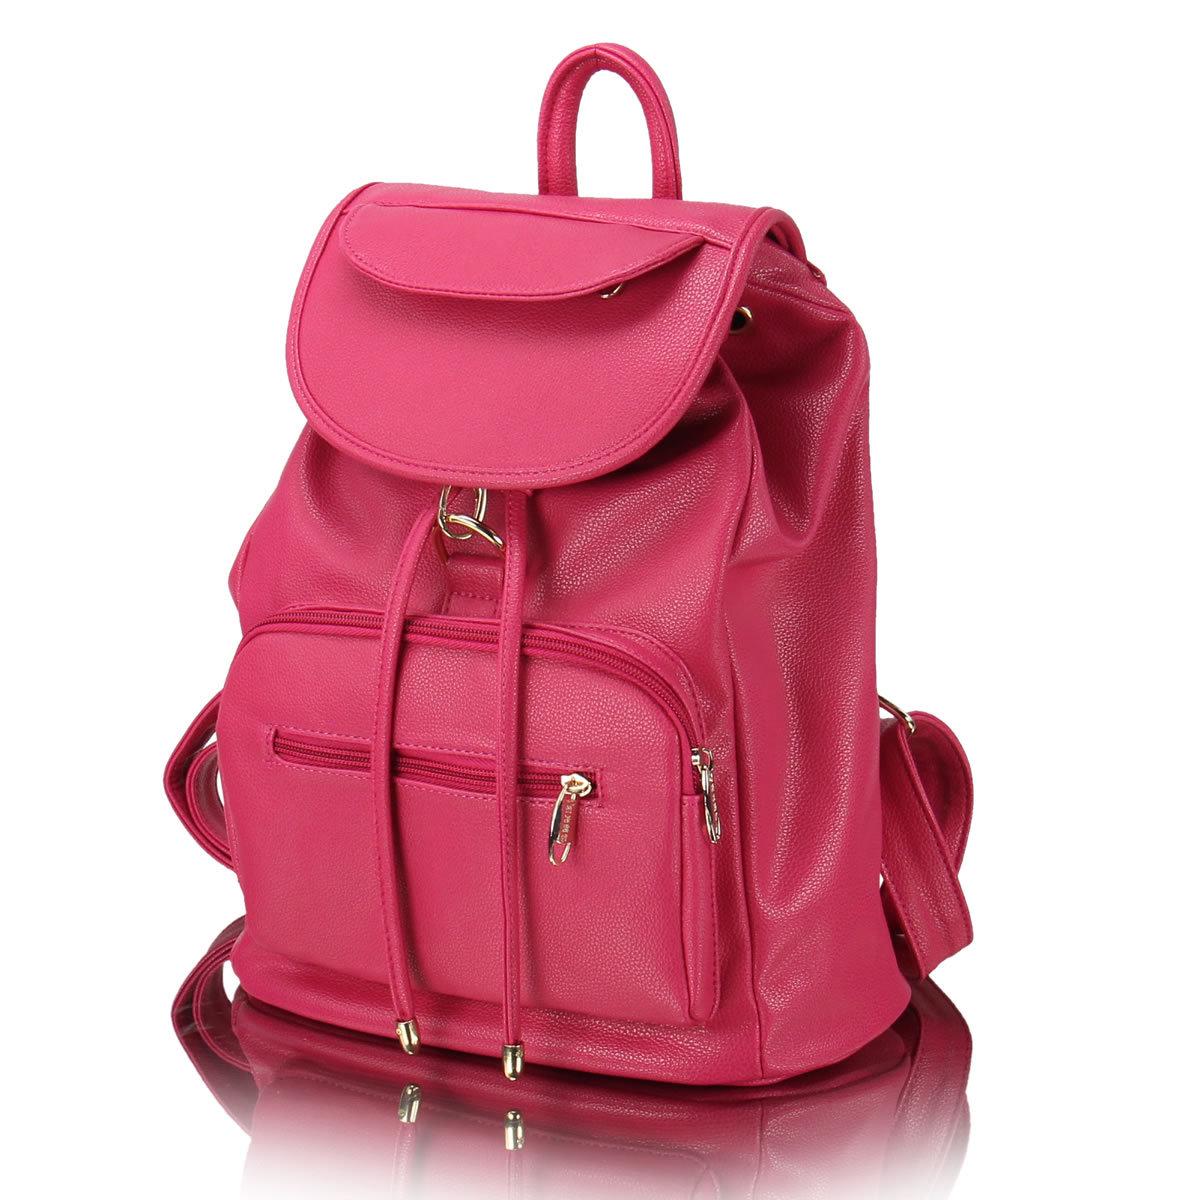 Women Leather School Backpack Rucksack Satchel GirlsHandbag Satchel Shoulder Bag